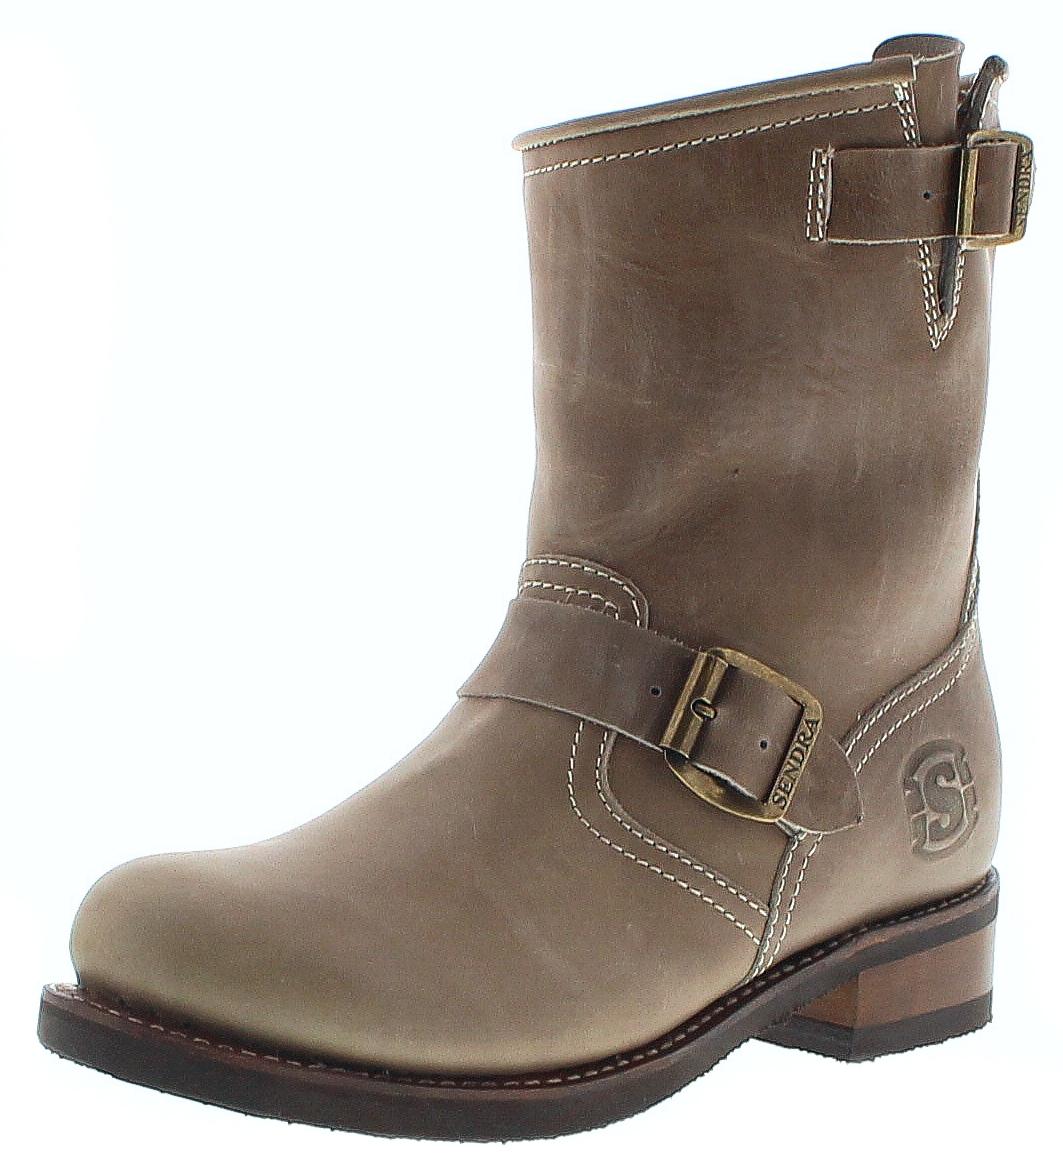 Futter Merinofell Hueso Mit Damen Merenillo Boots Engineer Sendra 10849 Braun Stiefel BxCoeQrdEW